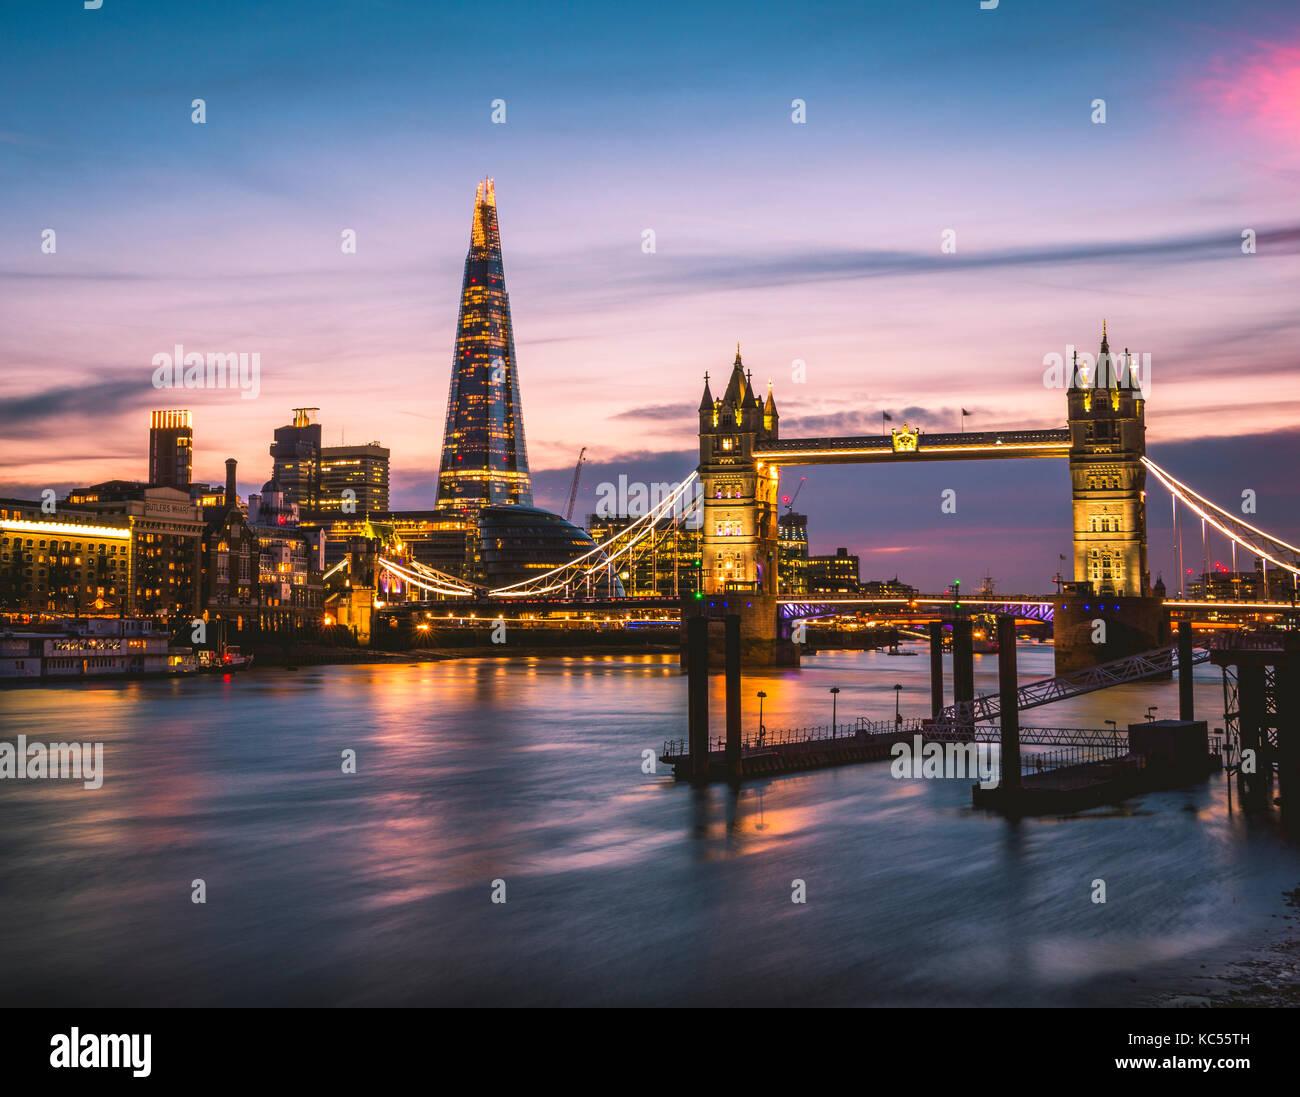 Themse, Tower Bridge, The Shard, Sunset, illuminated, Water view, Southwark, St Katharine's & Wapping, London, - Stock Image